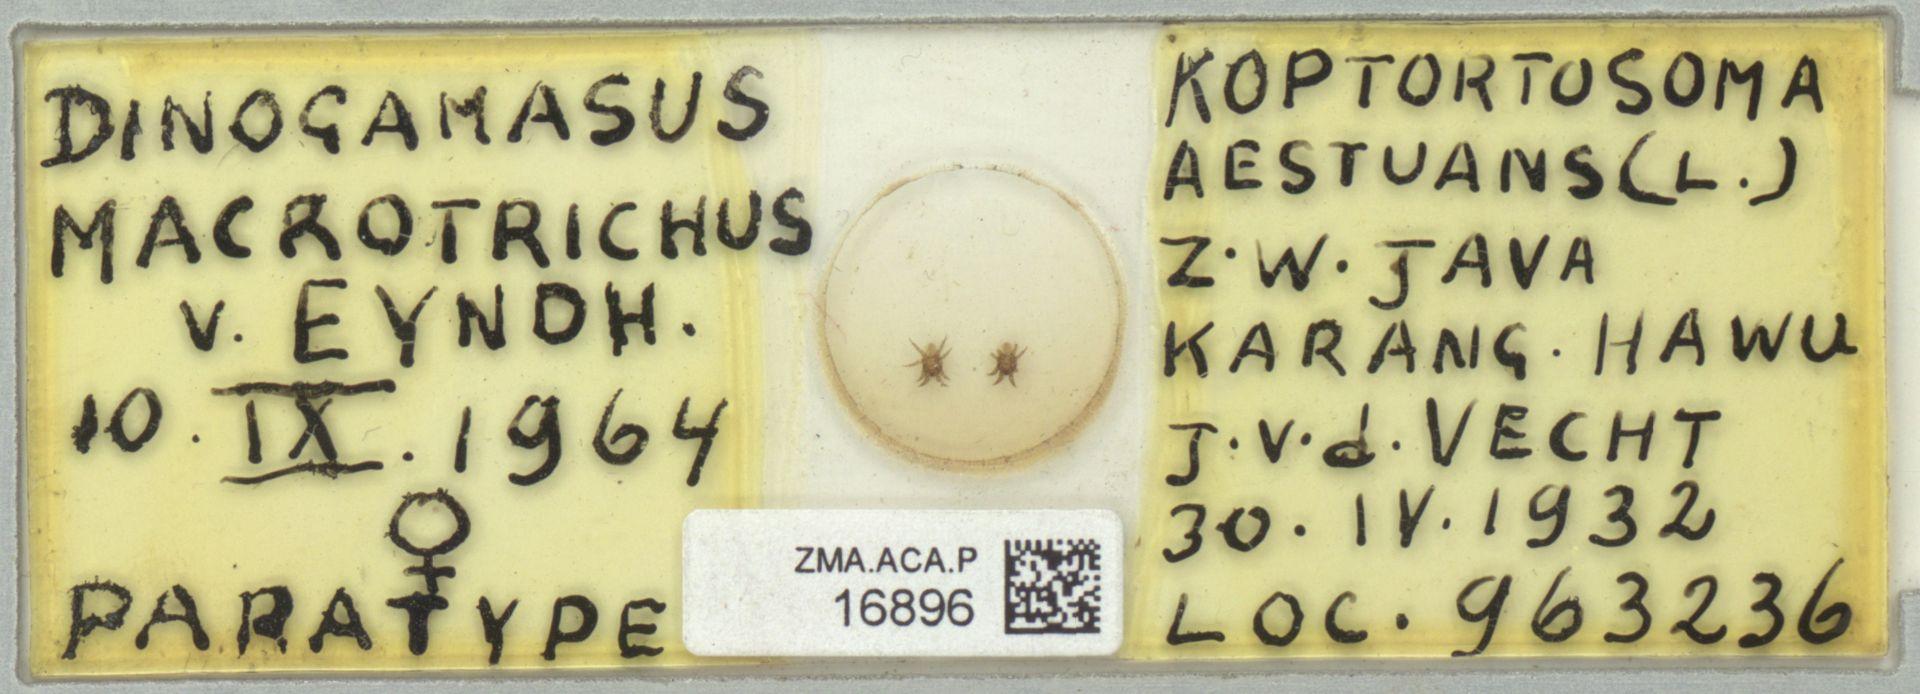 ZMA.ACA.P.16896   Dinogamasus macrotrichus